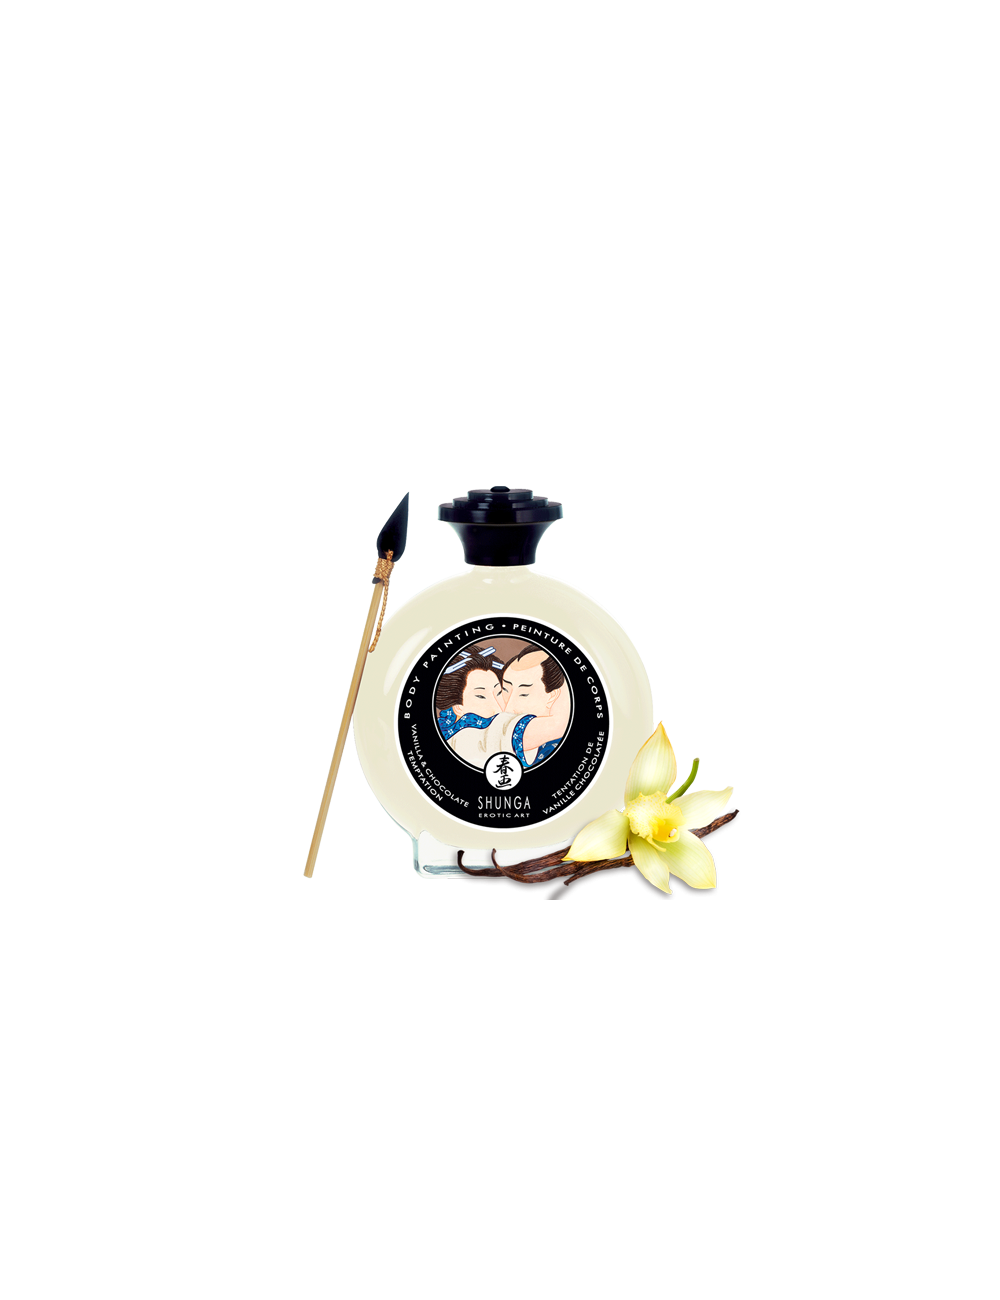 Peinture de corps embrassable chocolat blanc / vanille Shunga